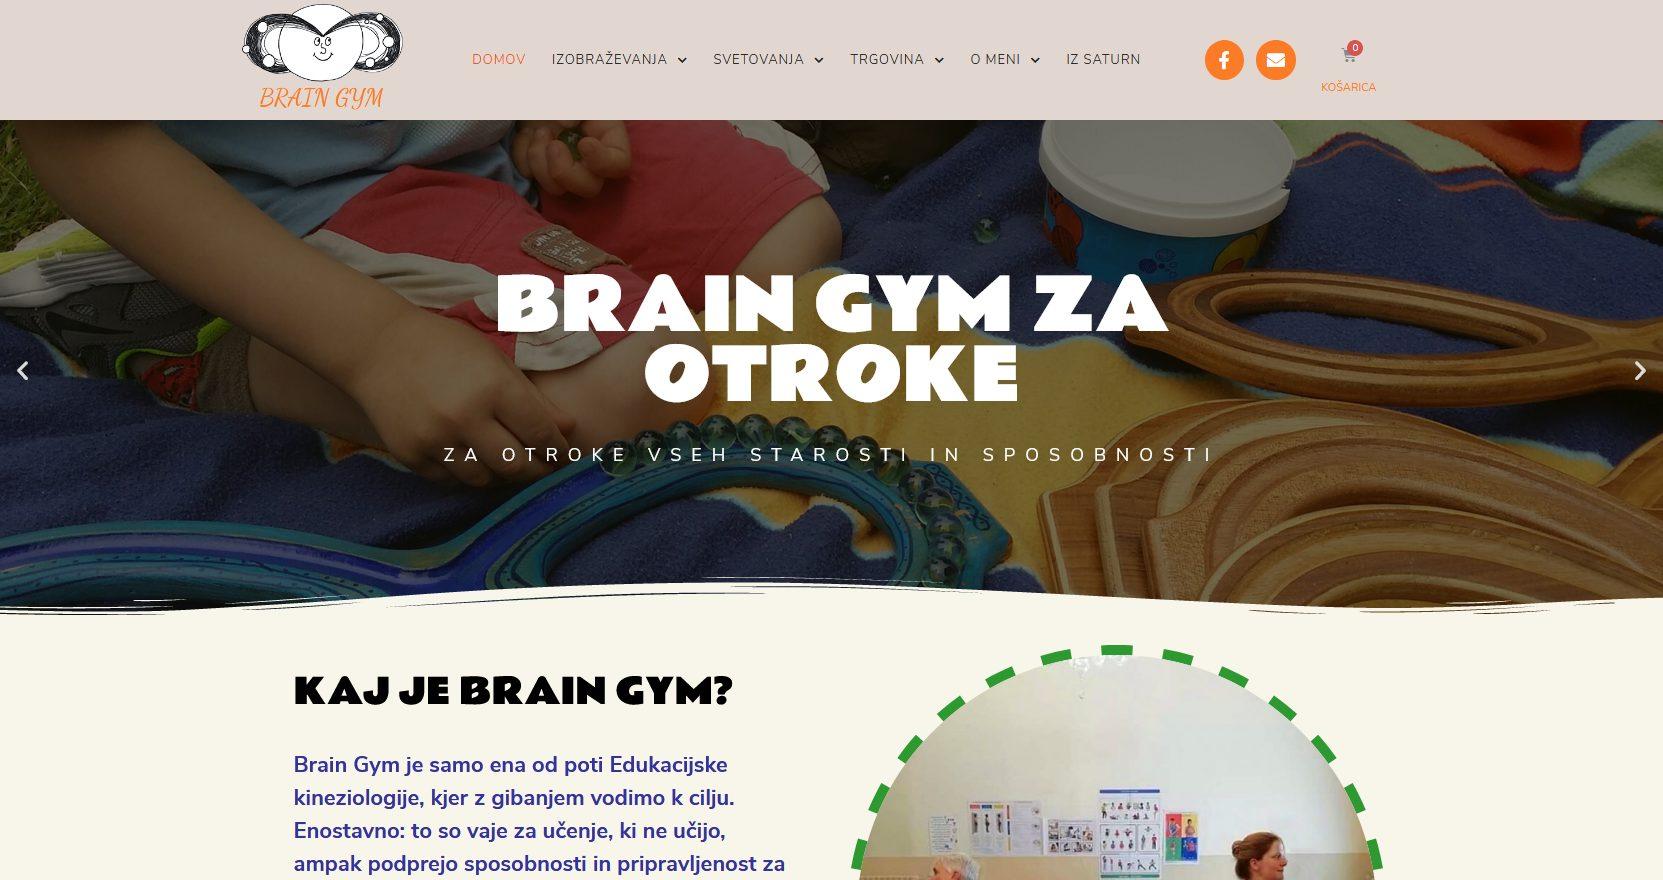 website design example - Brain Gym website by Ian Middleton